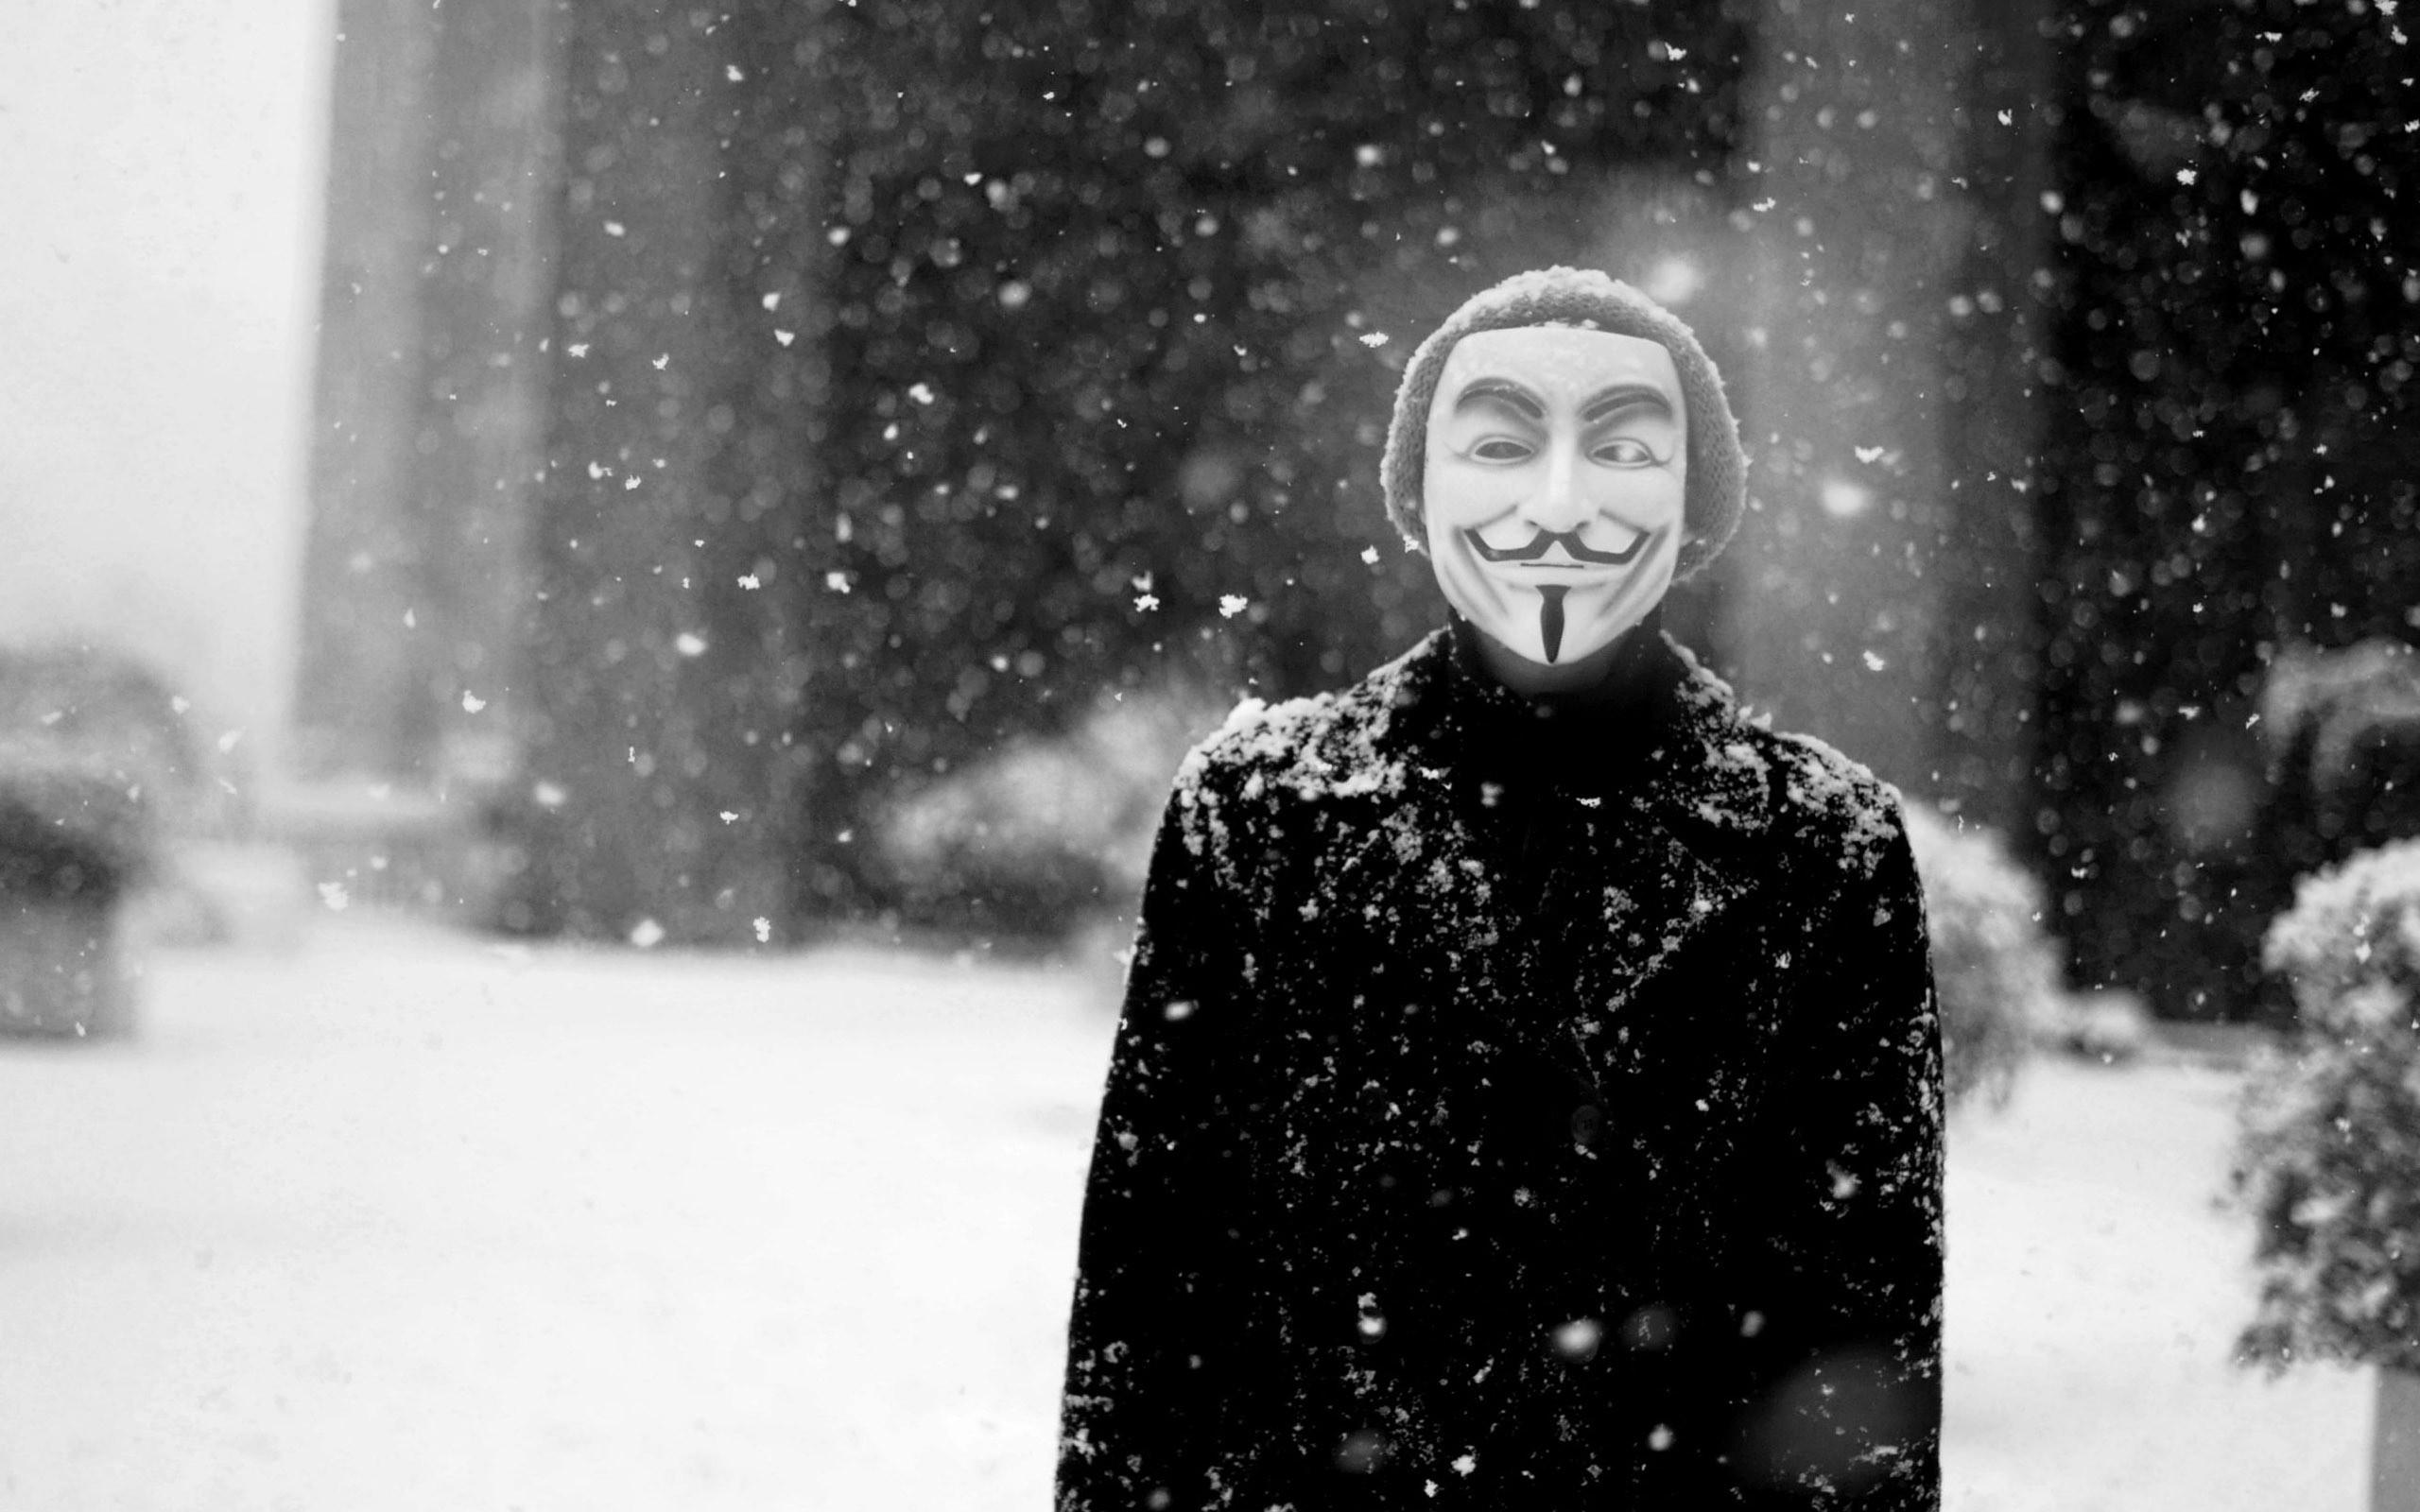 … Anonymous HD Wallpaper 2560×1600